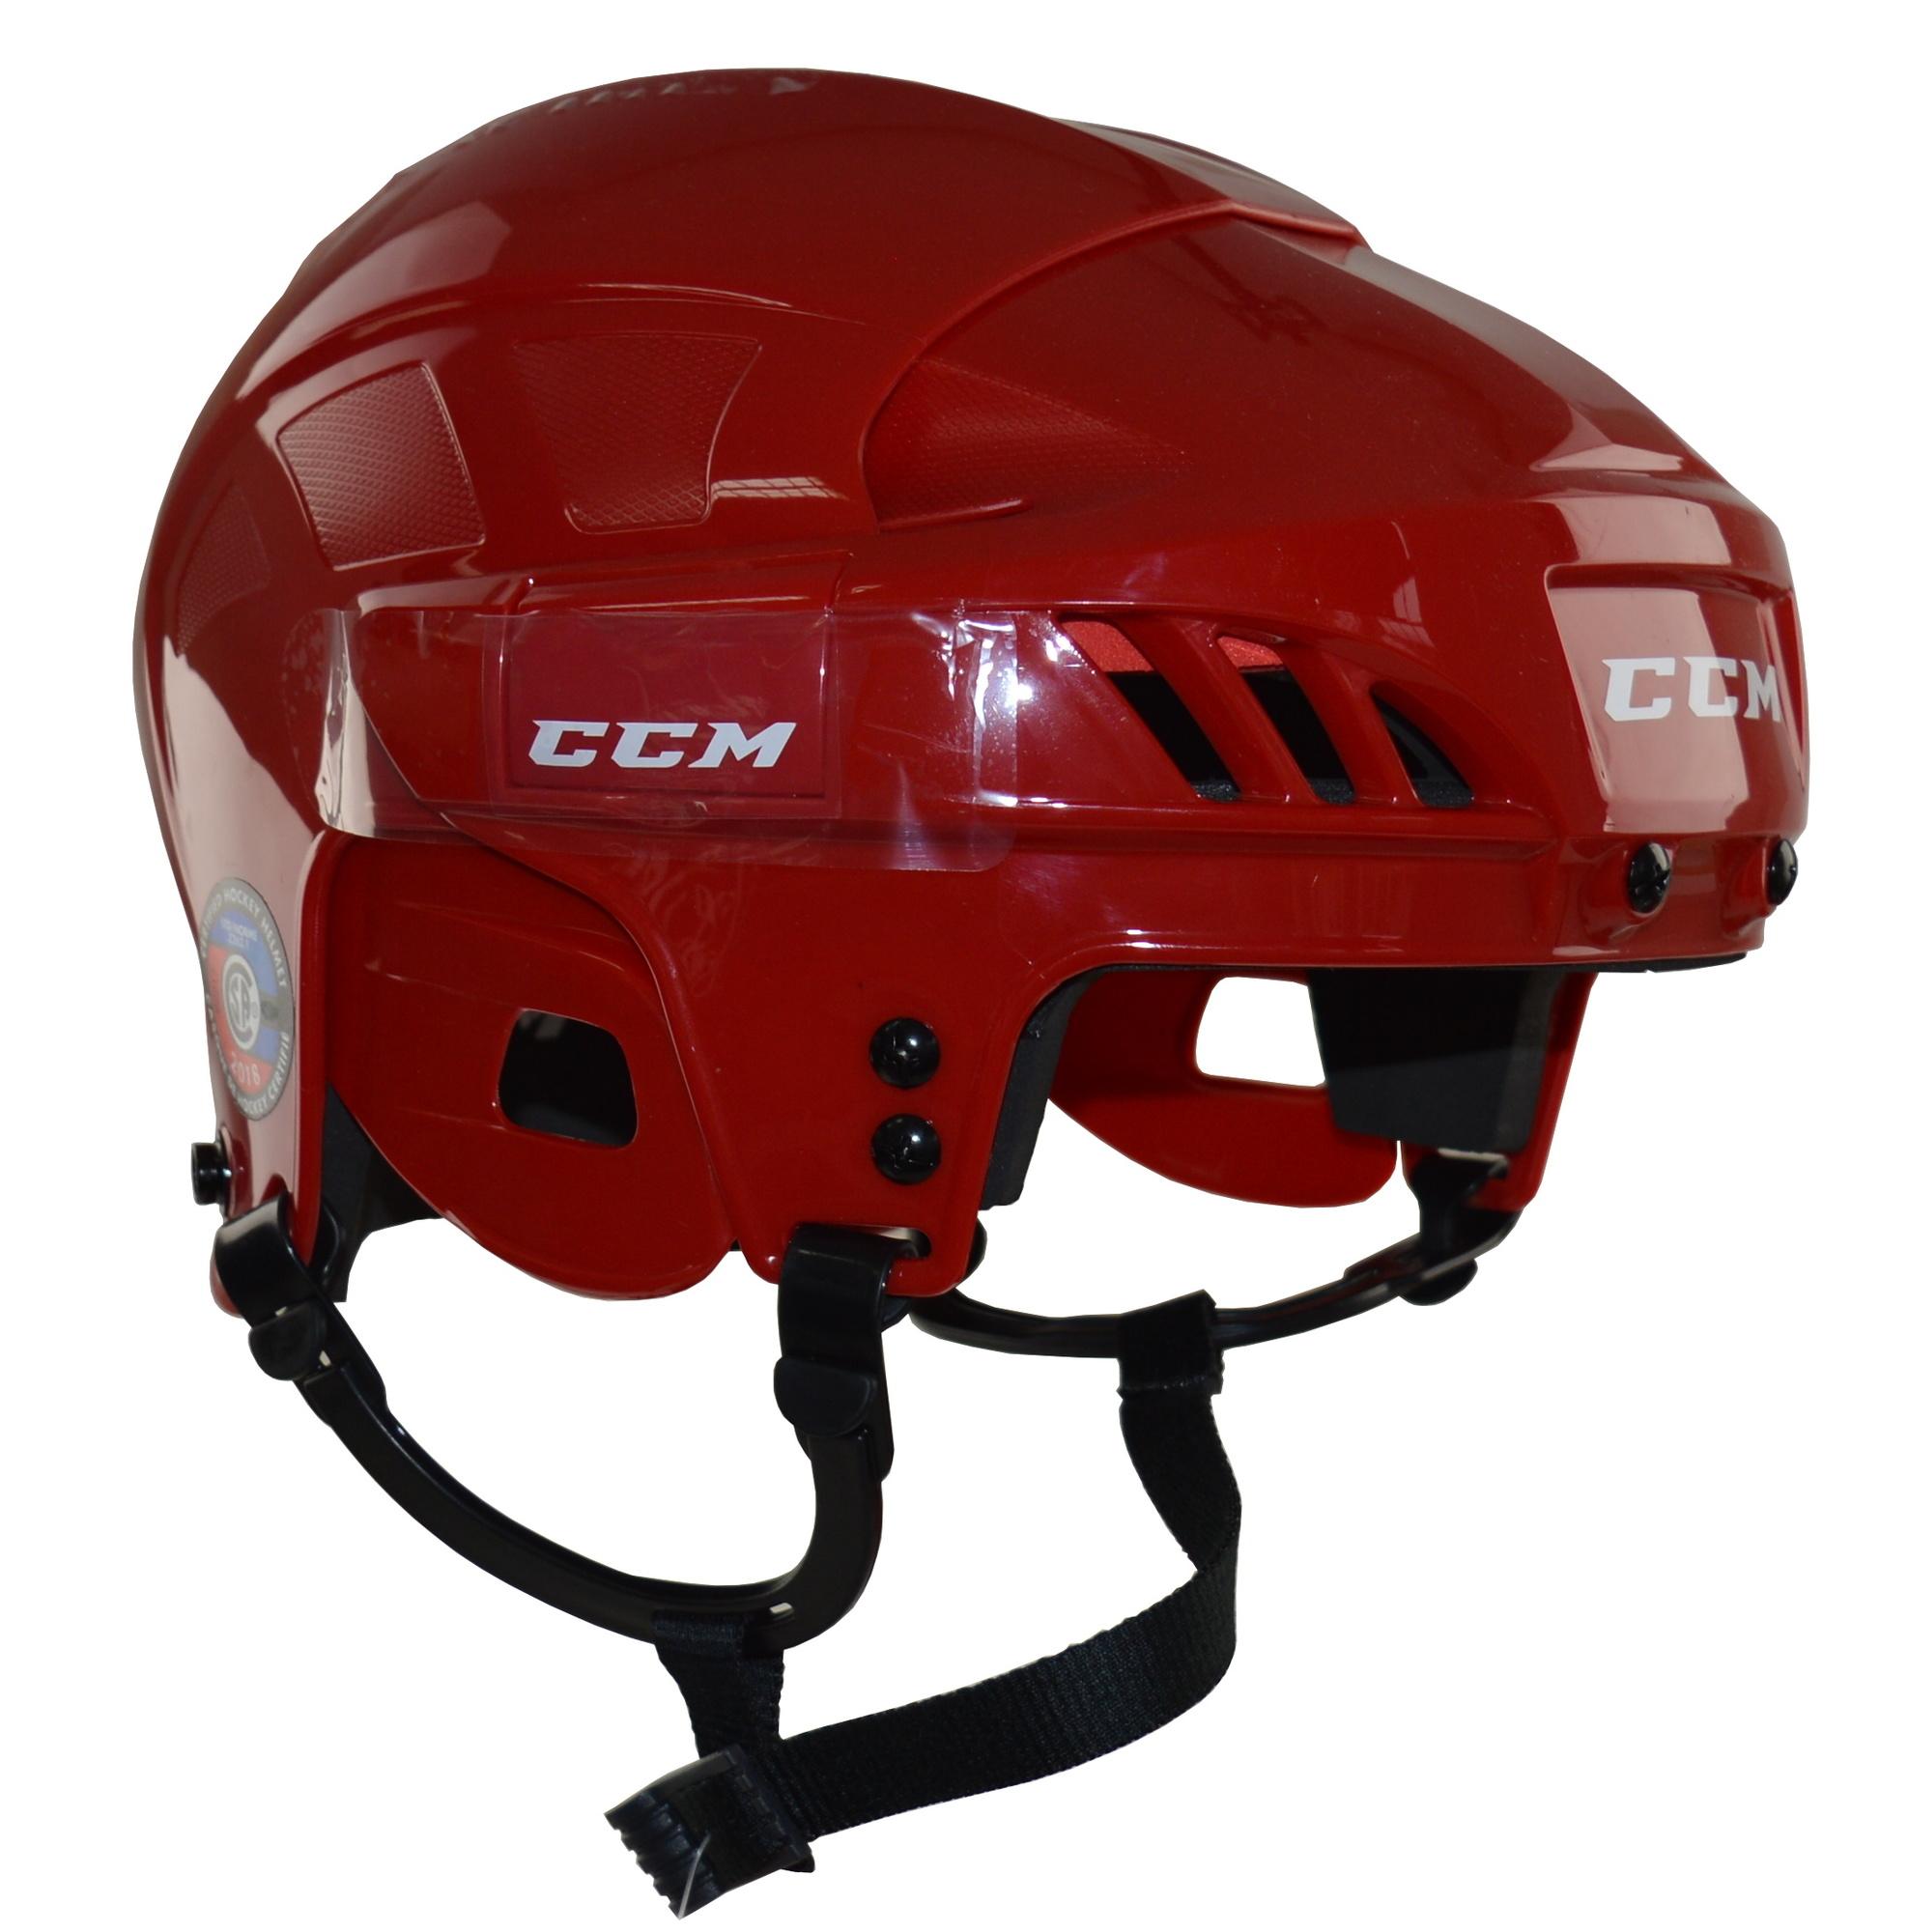 Helma CCM 50 SR, červená, Senior, L, 58-62cm